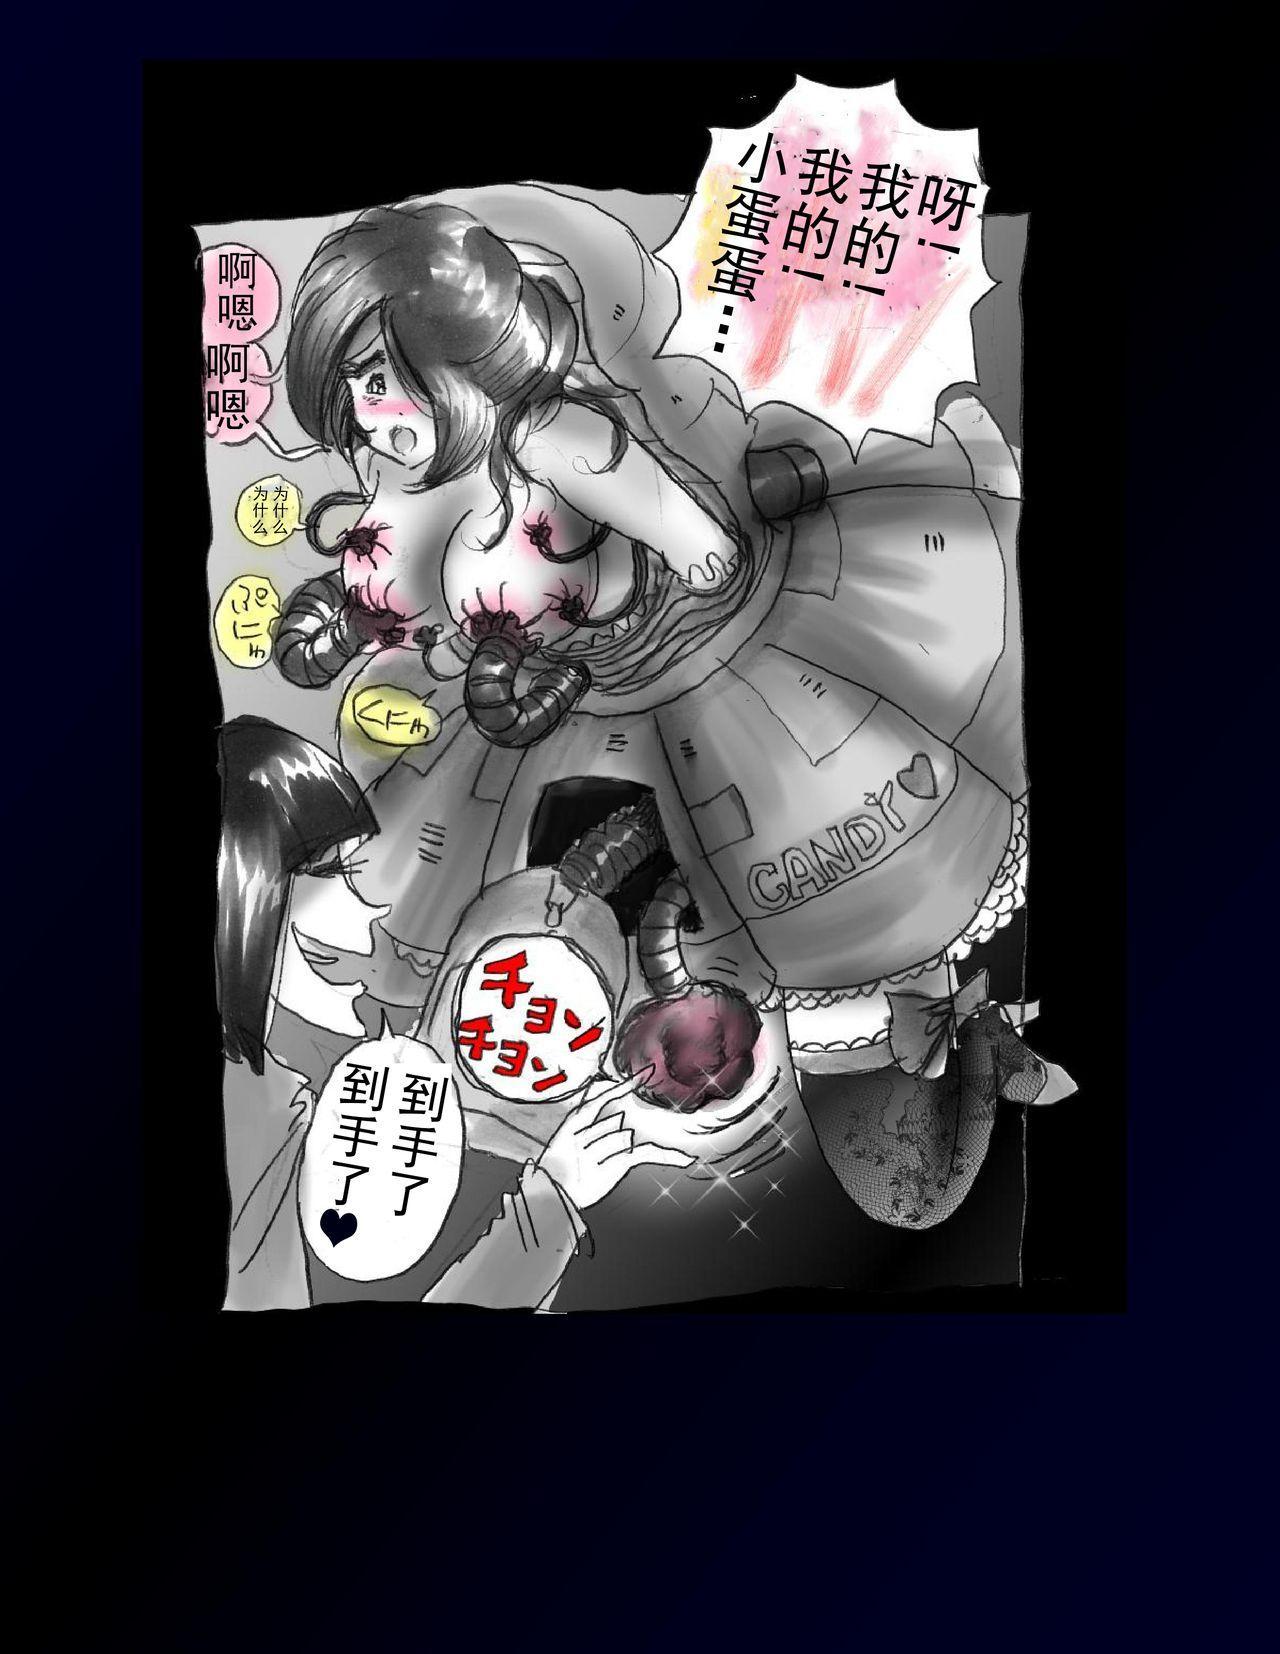 Kyousei Nyotaika Dress 38